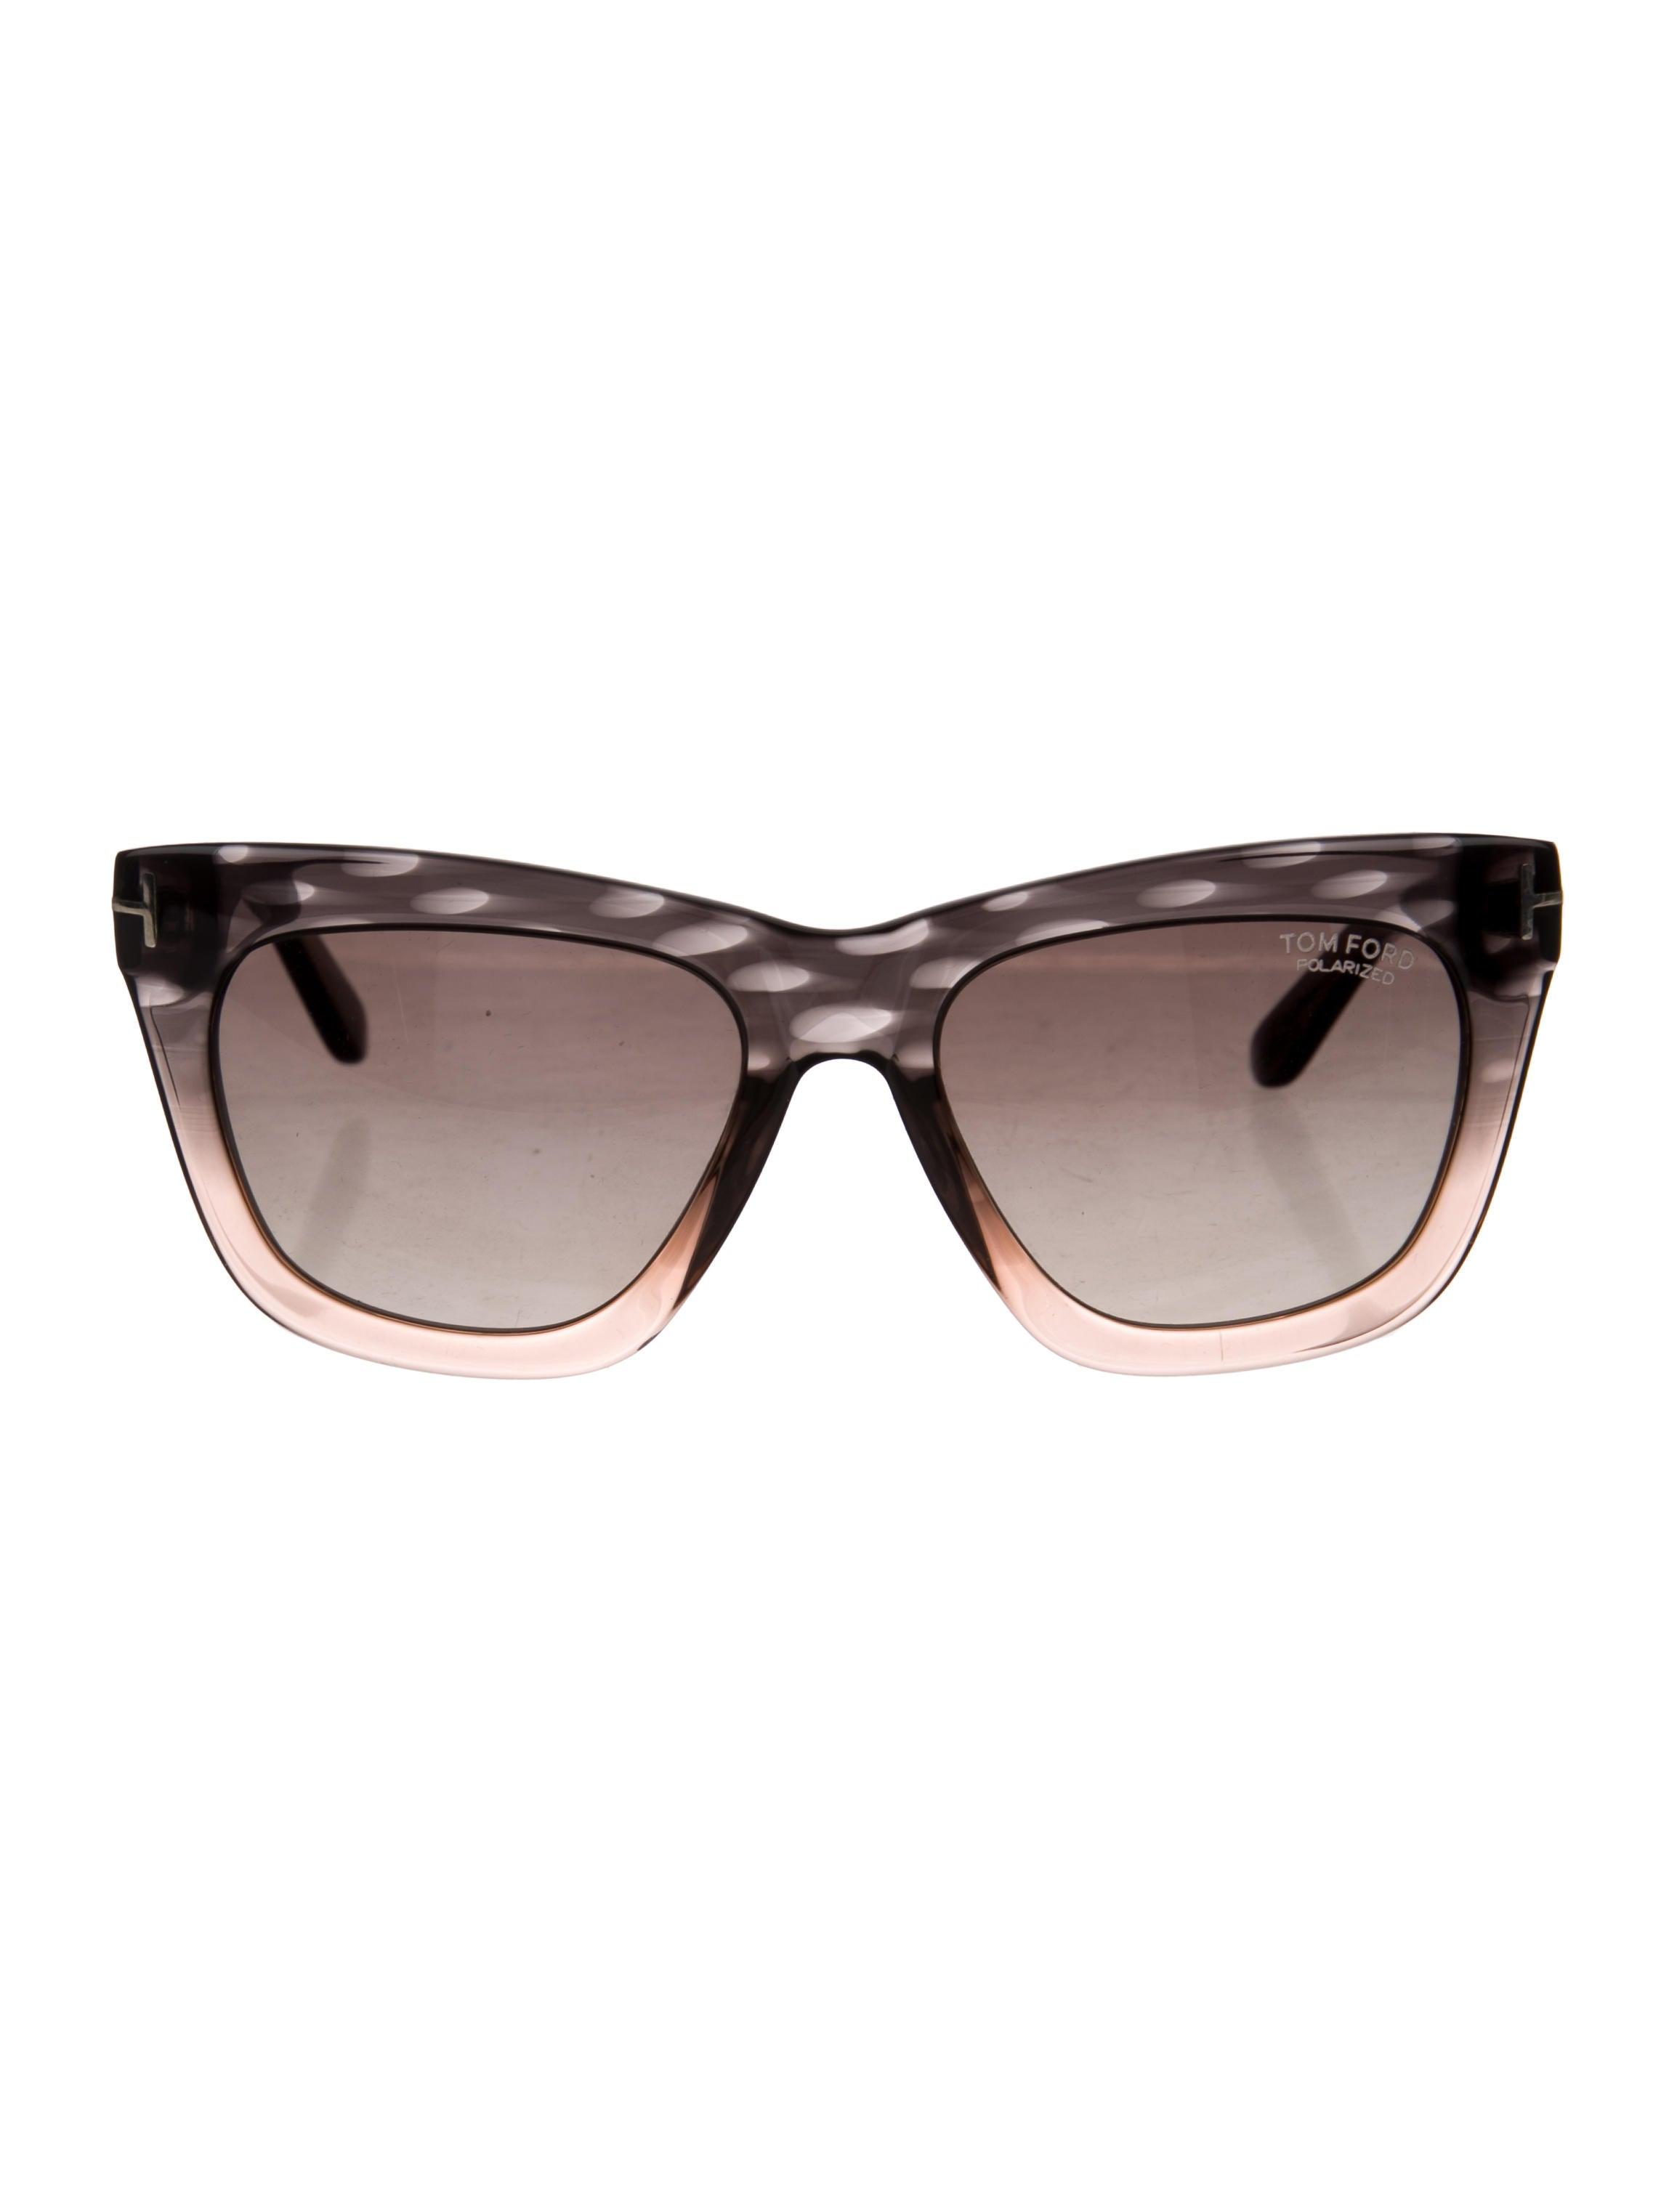 1794667d191d ... Tom Ford Celina Polarized Sunglasses. Celina Polarized Sunglasses